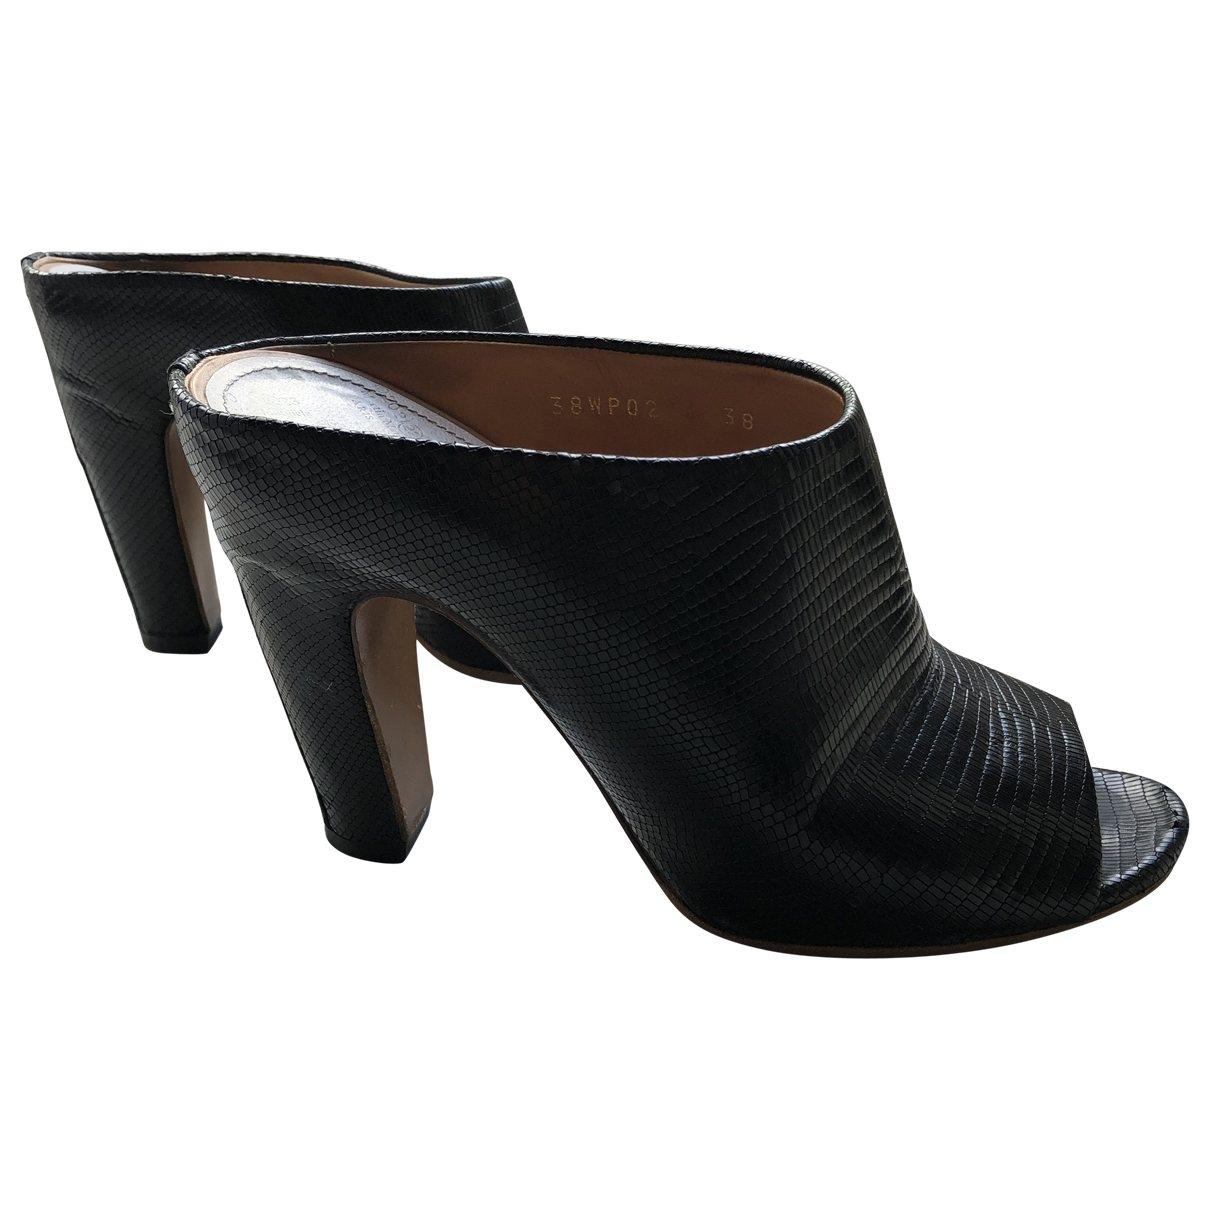 Maison Martin Margiela \N Black Python Sandals for Women 38 EU